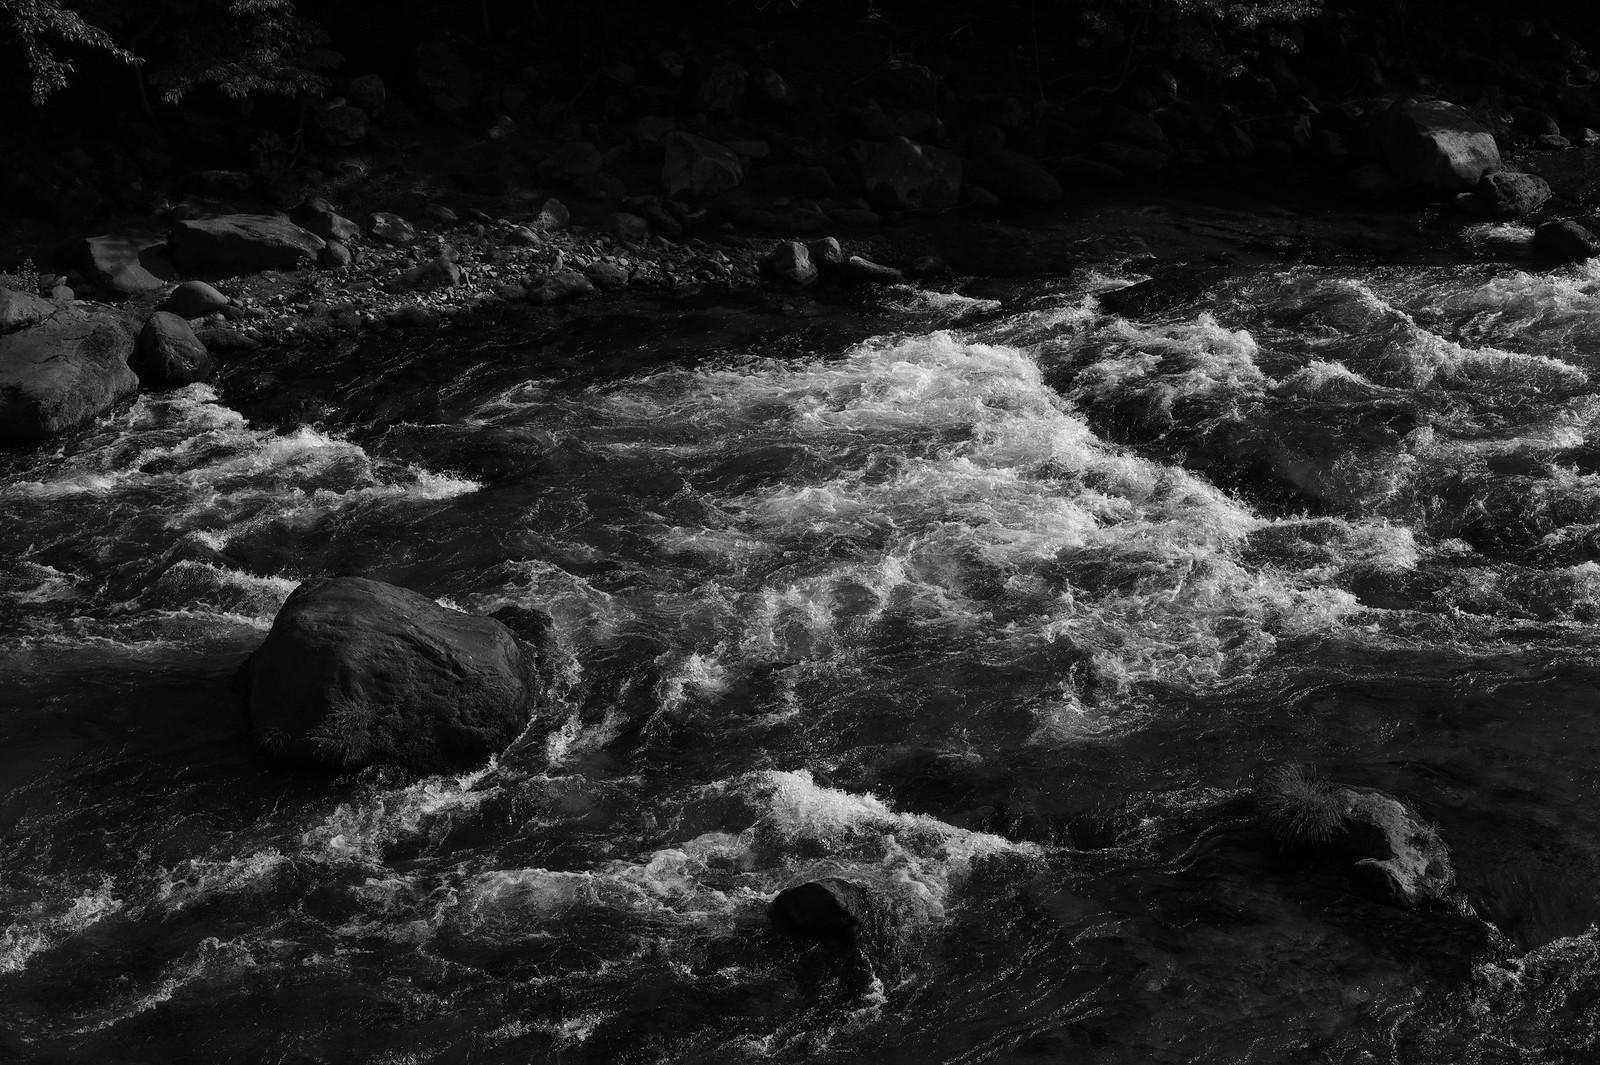 raging stream